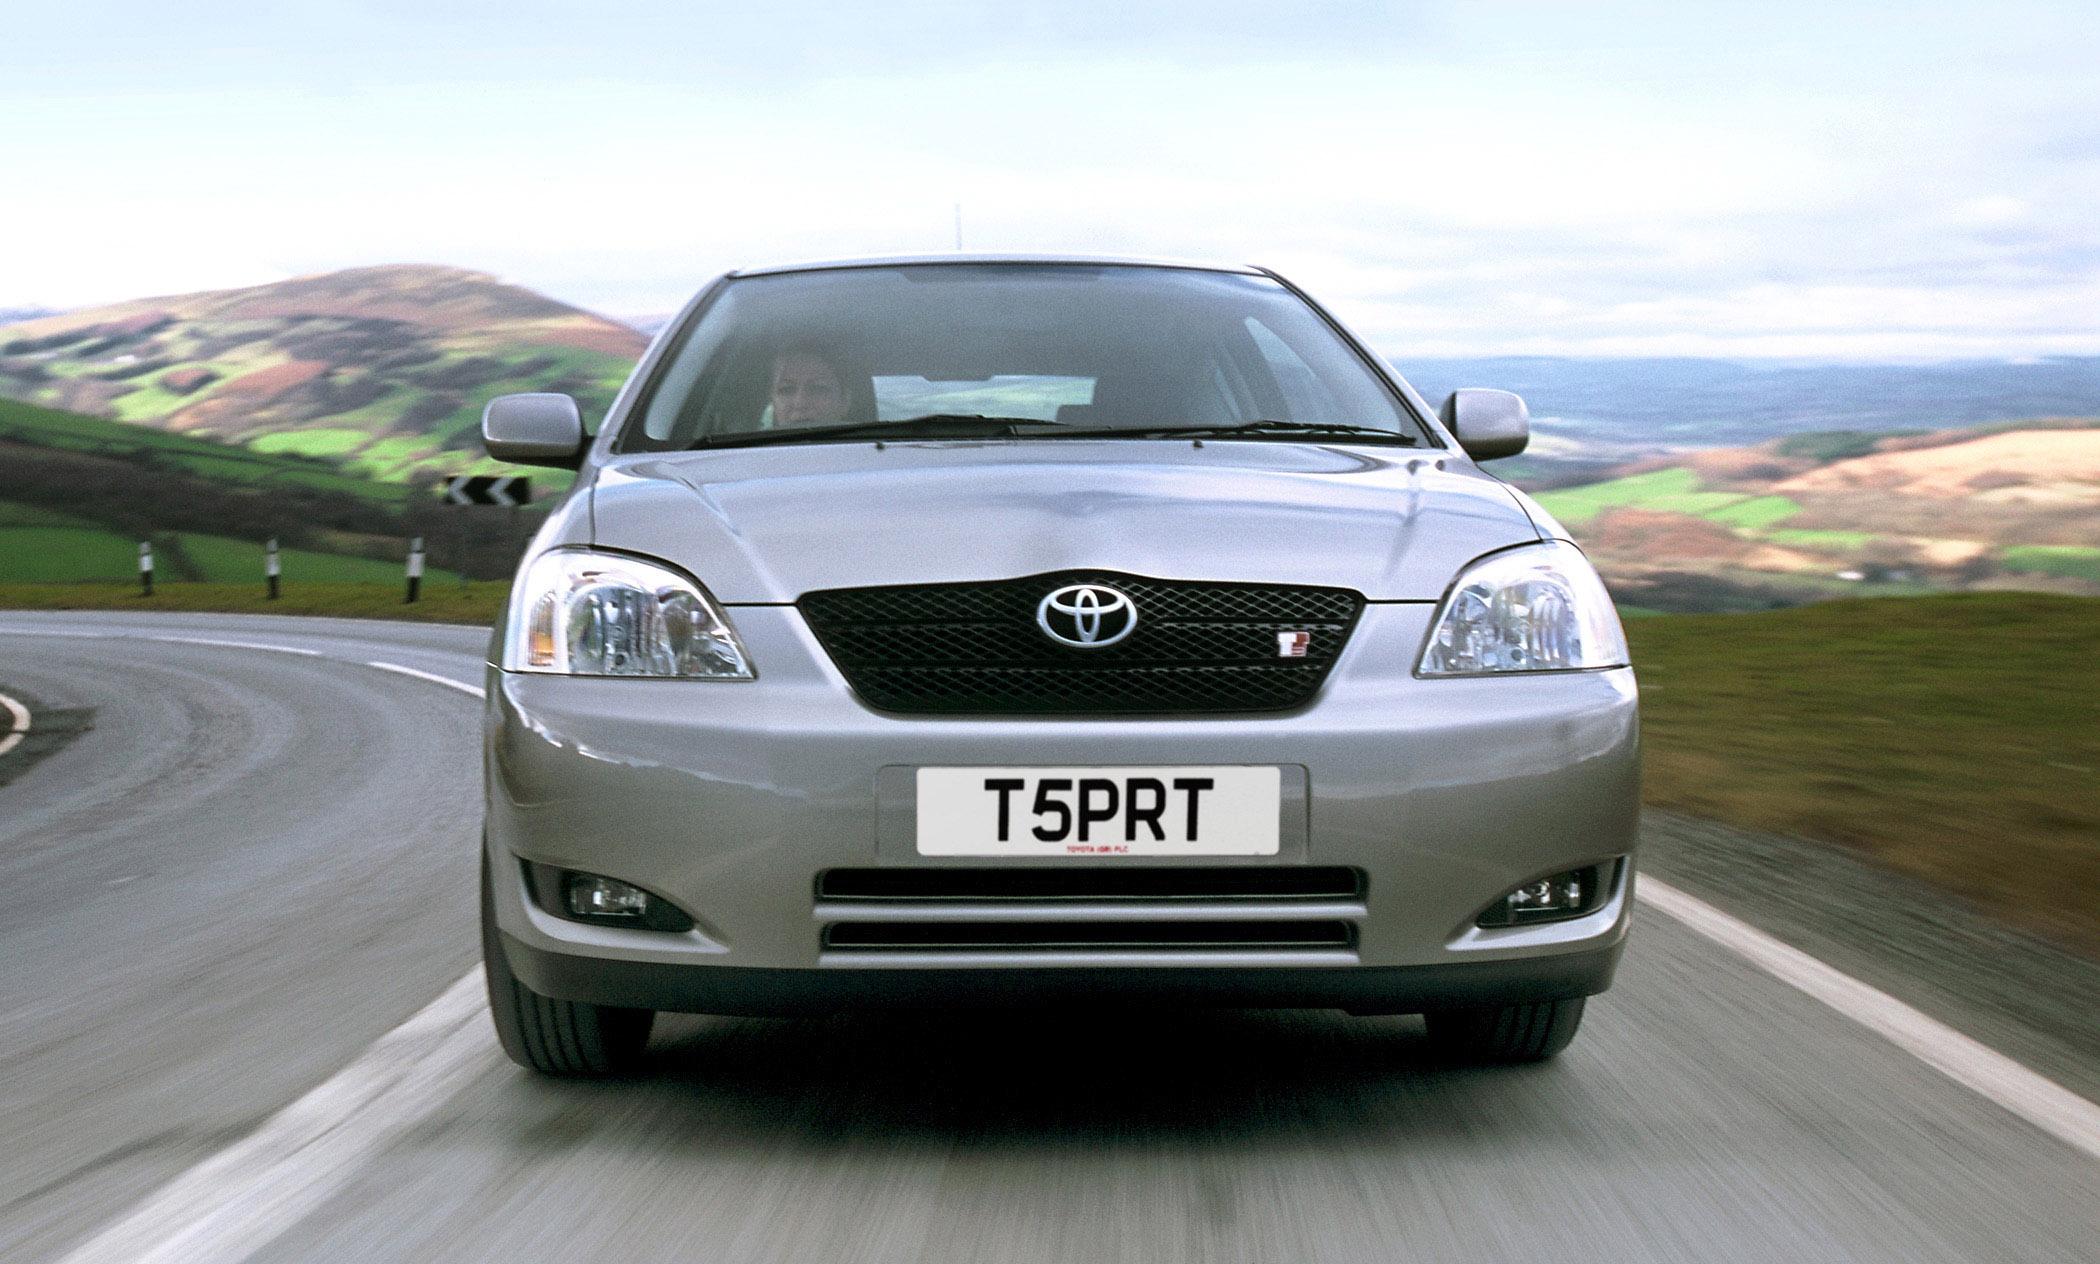 Bmw Cufflinks ... Cufflinks further 2002 Toyota Corolla Sport moreover 2015 Ford Mustang